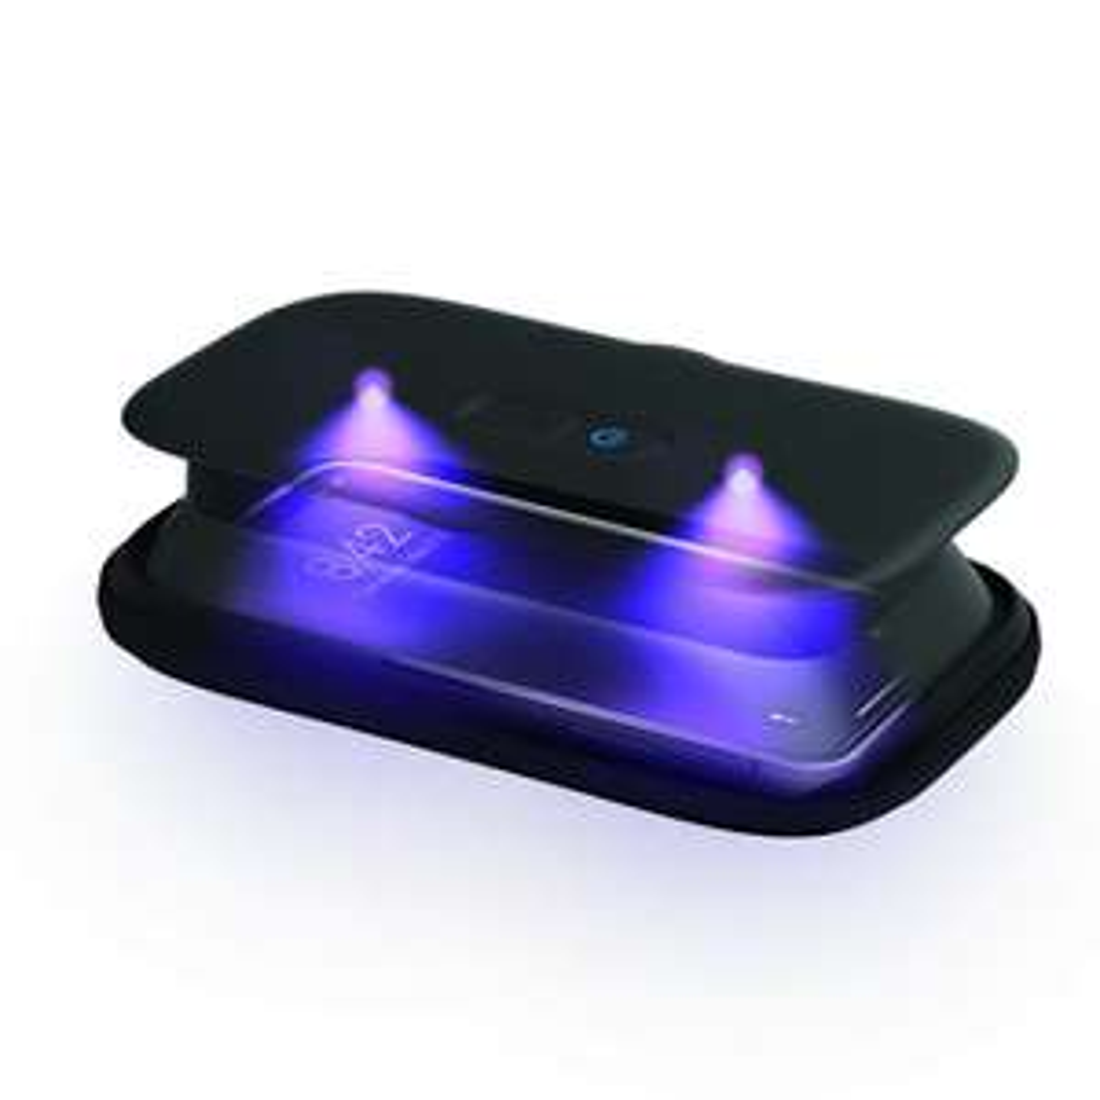 HoMedics UV-CLEAN Phone Sanitiser - £49.99 @ Homedics Shop